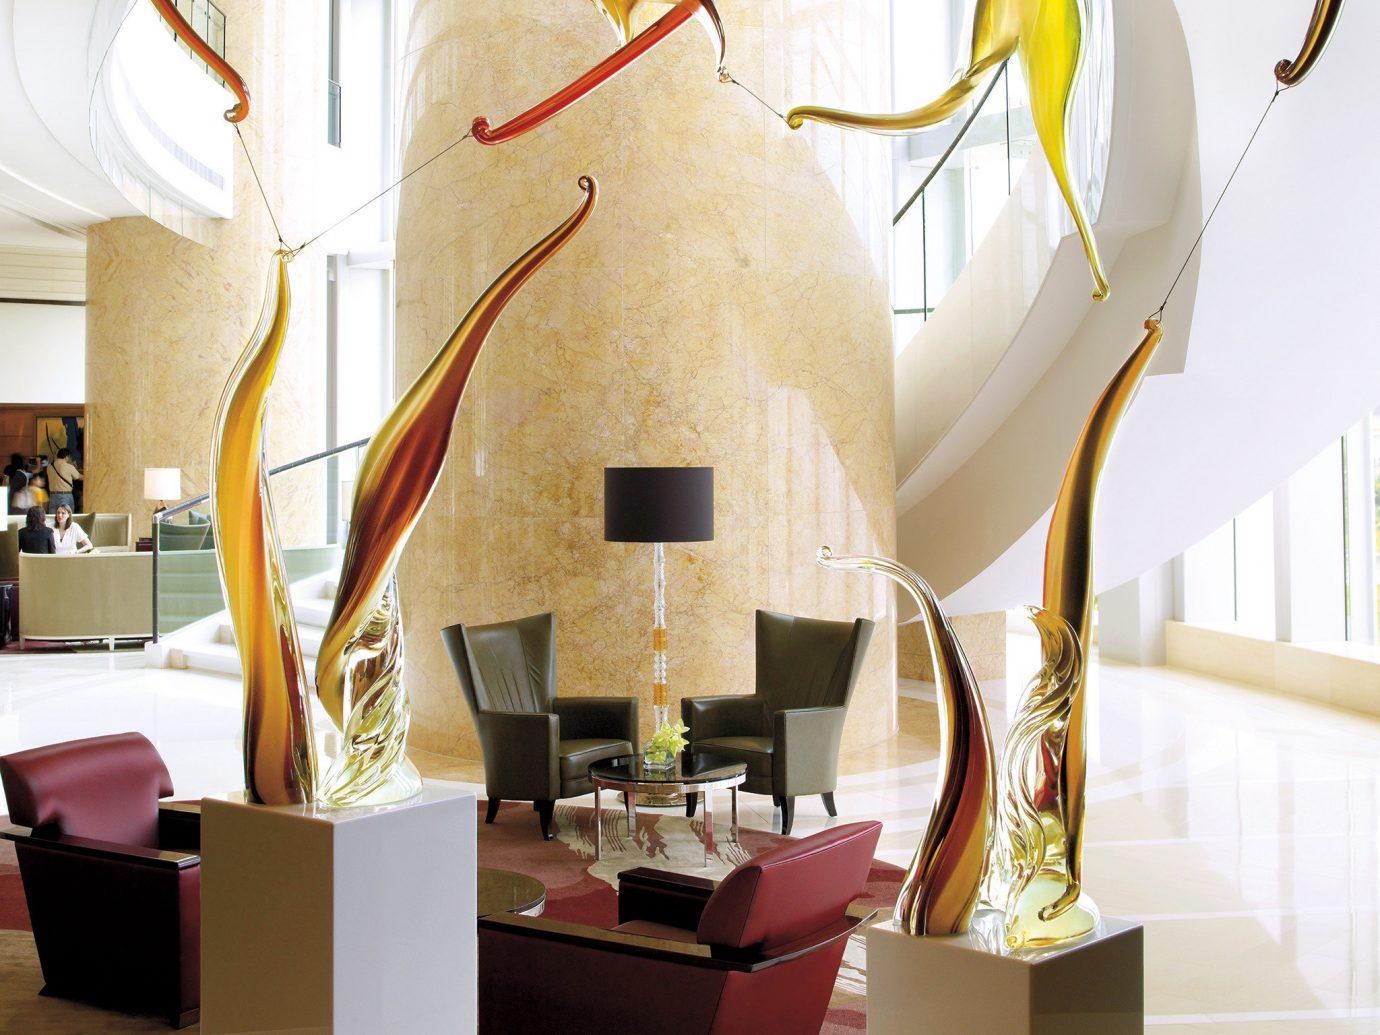 Business City Design Hotels Living indoor art interior design decorated